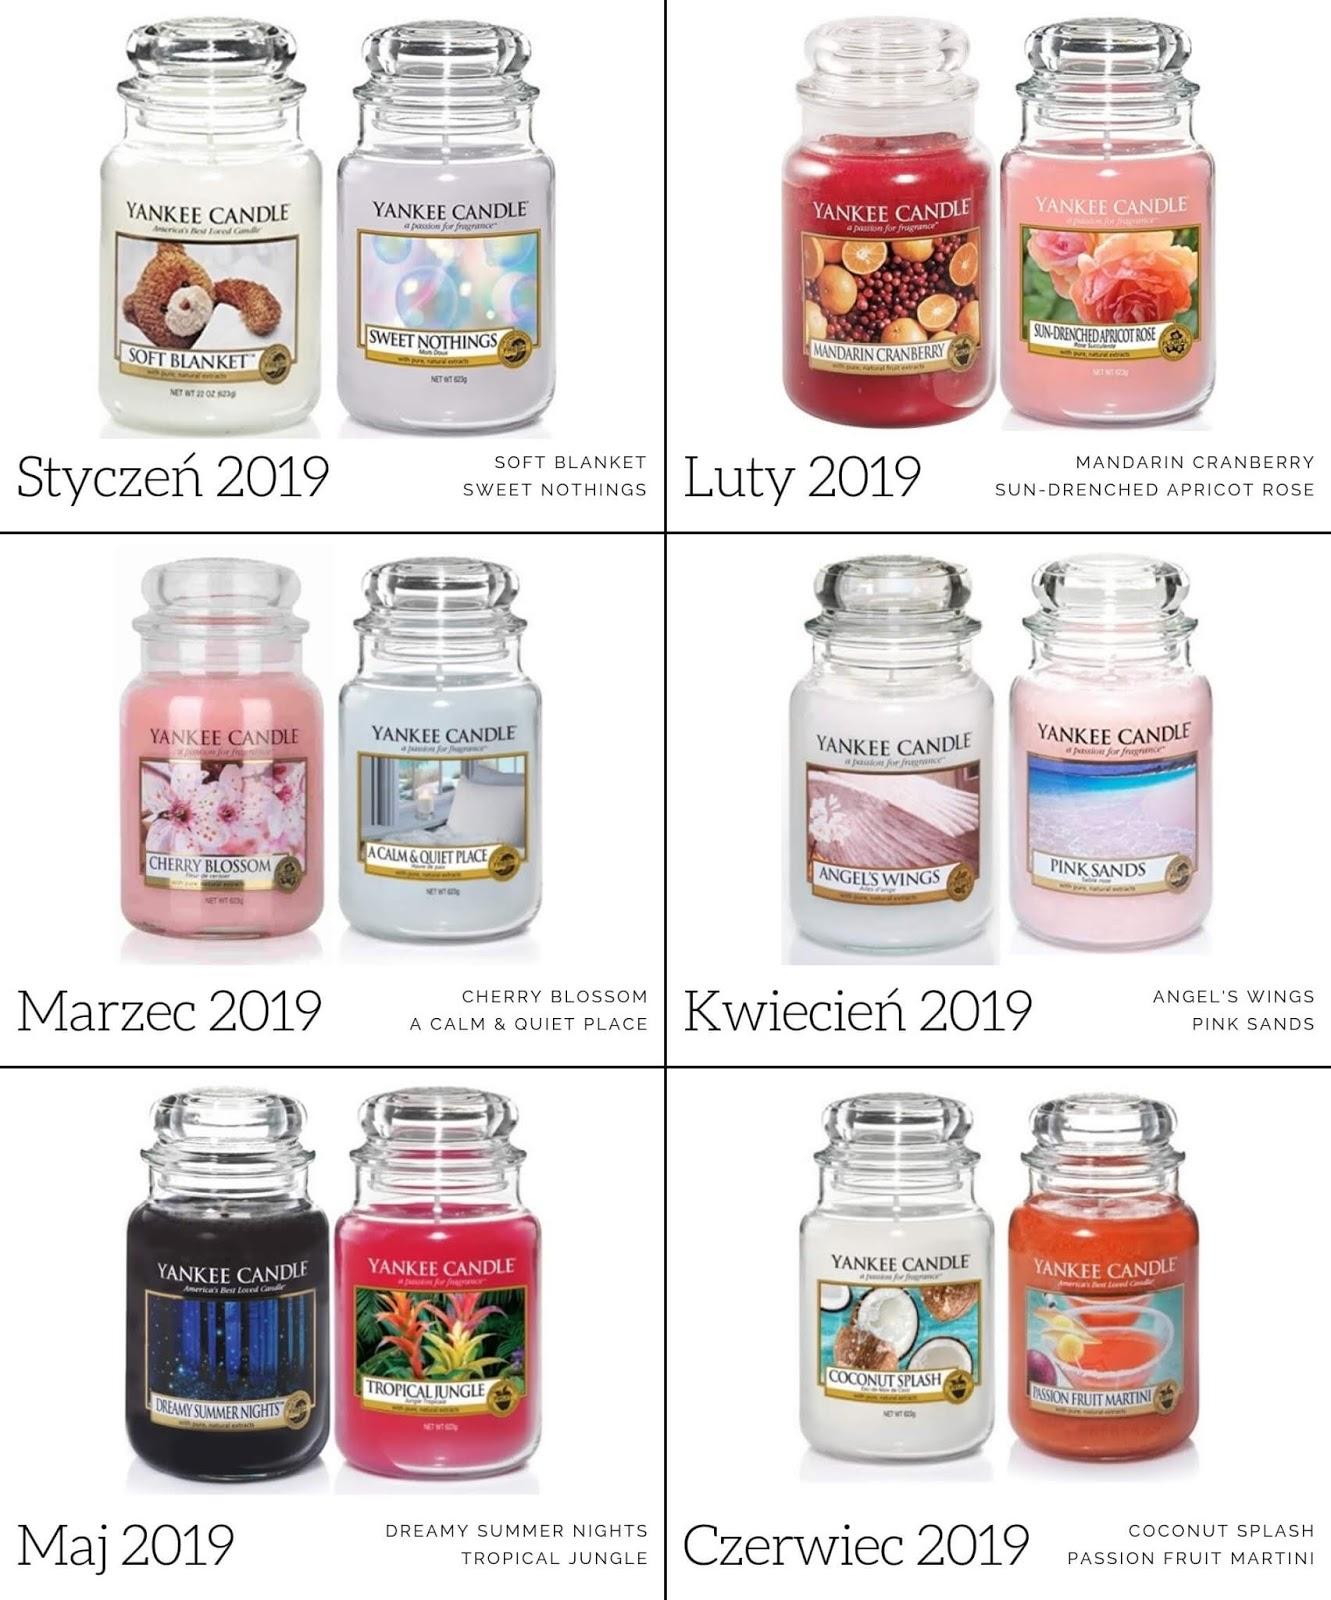 zapach miesiąca yankee candle 2019